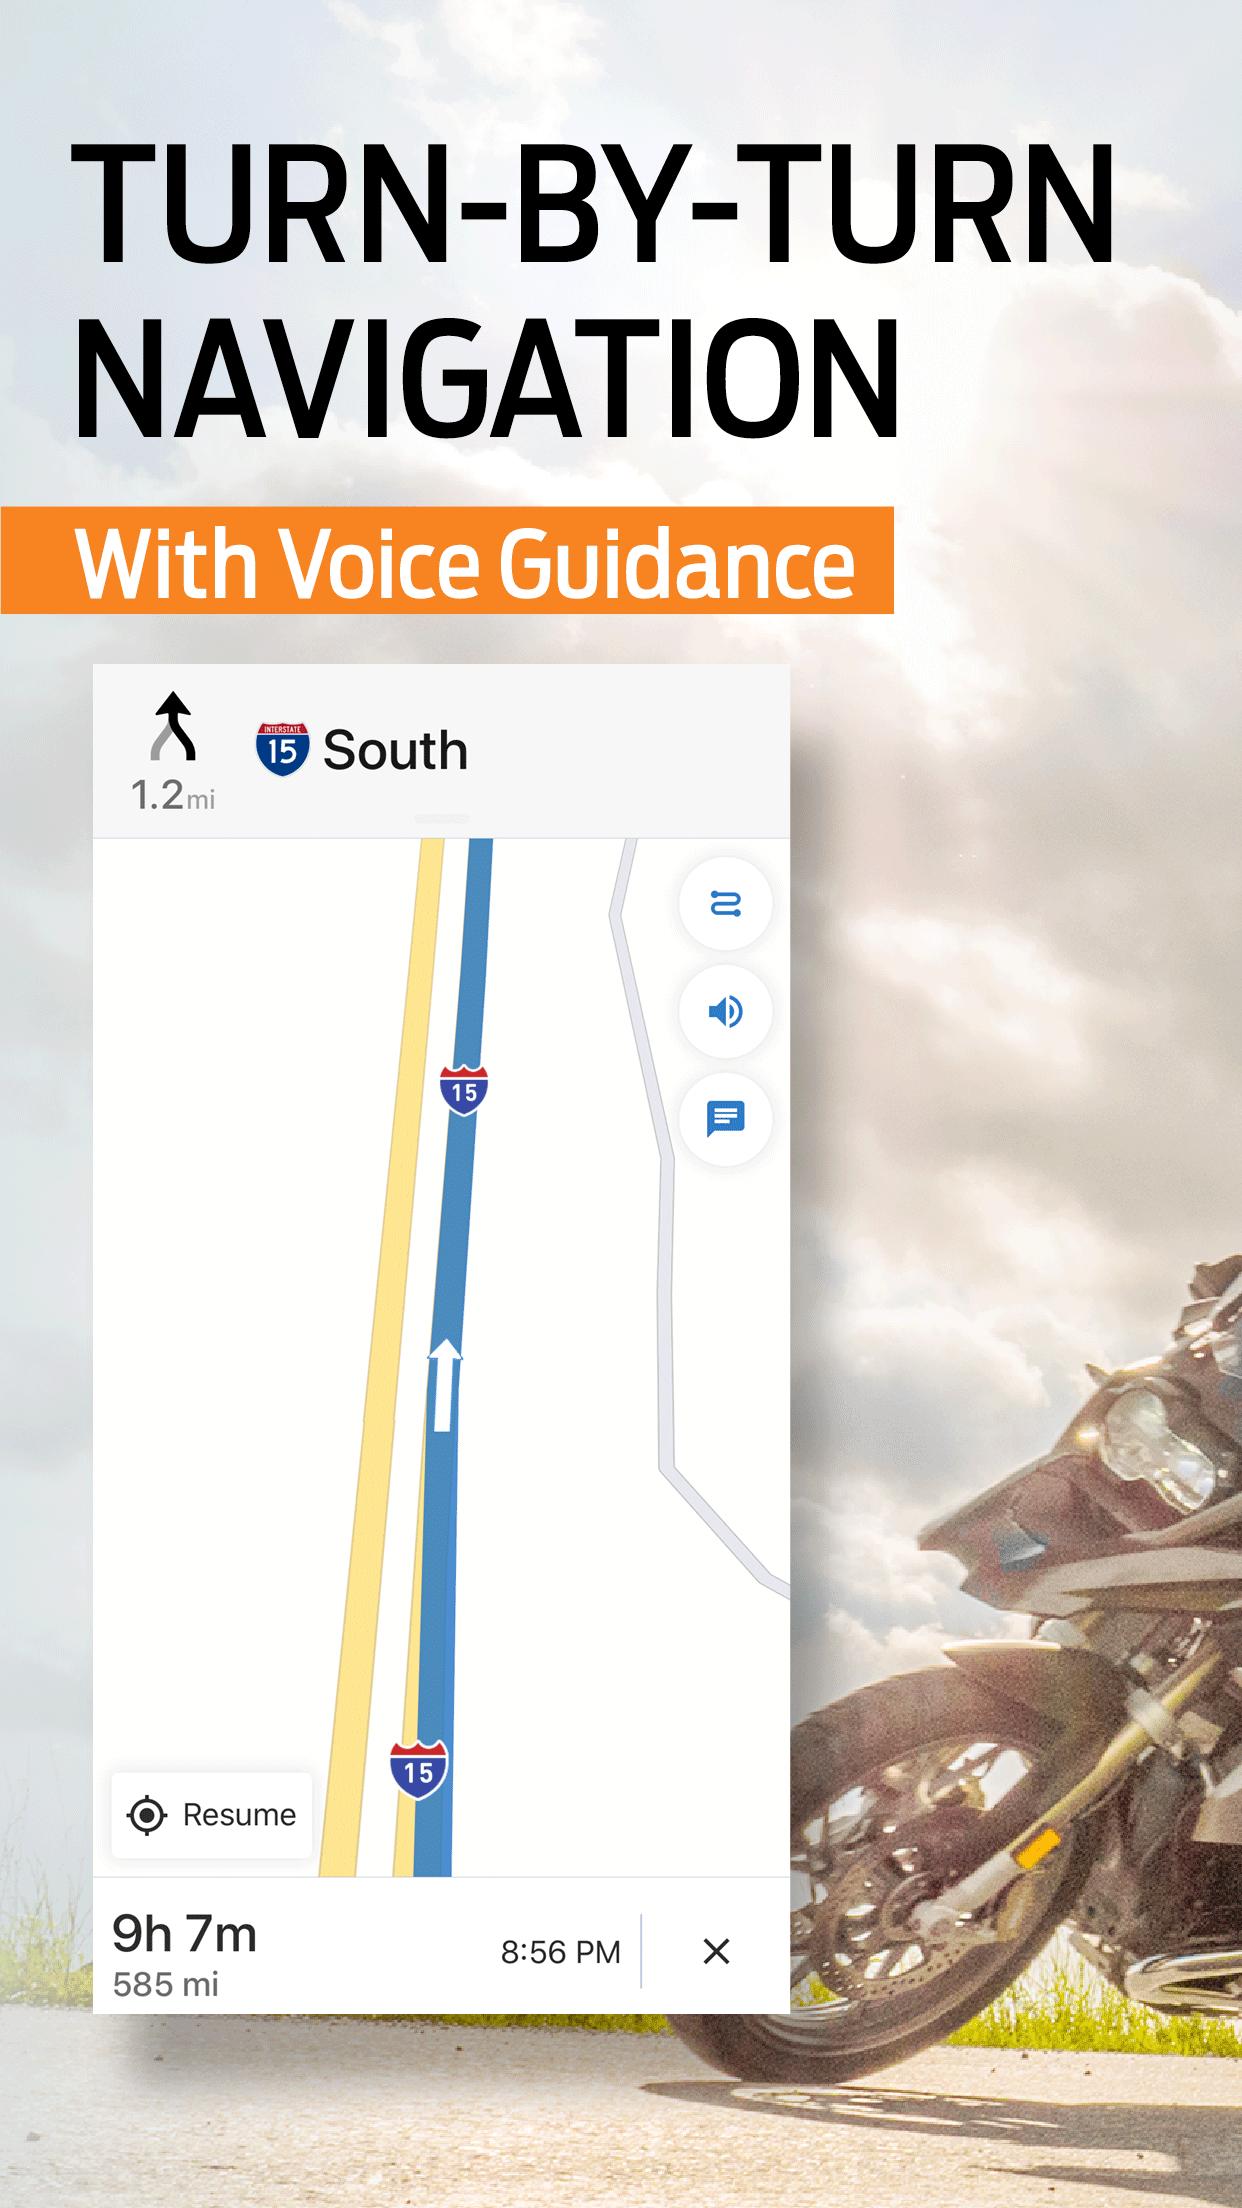 REVER: Motorcycle, Maps, & GPS Screenshot